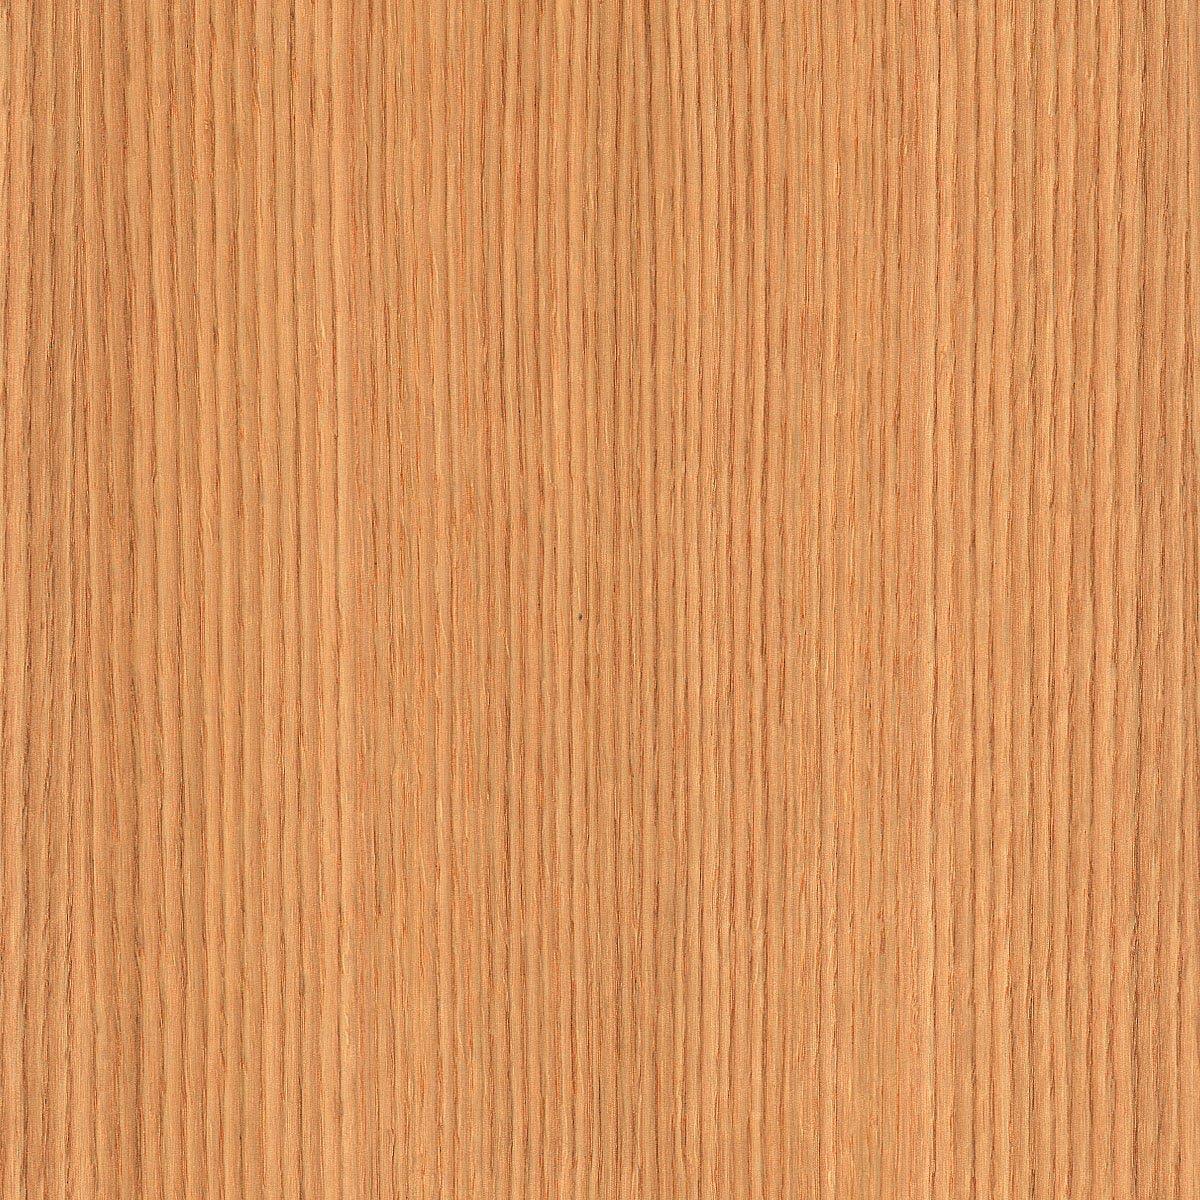 "24/"" X 96/"" Sheet White Oak Wood Veneer RIFT CUT Paper Backer Backing 2/' X 8/'"